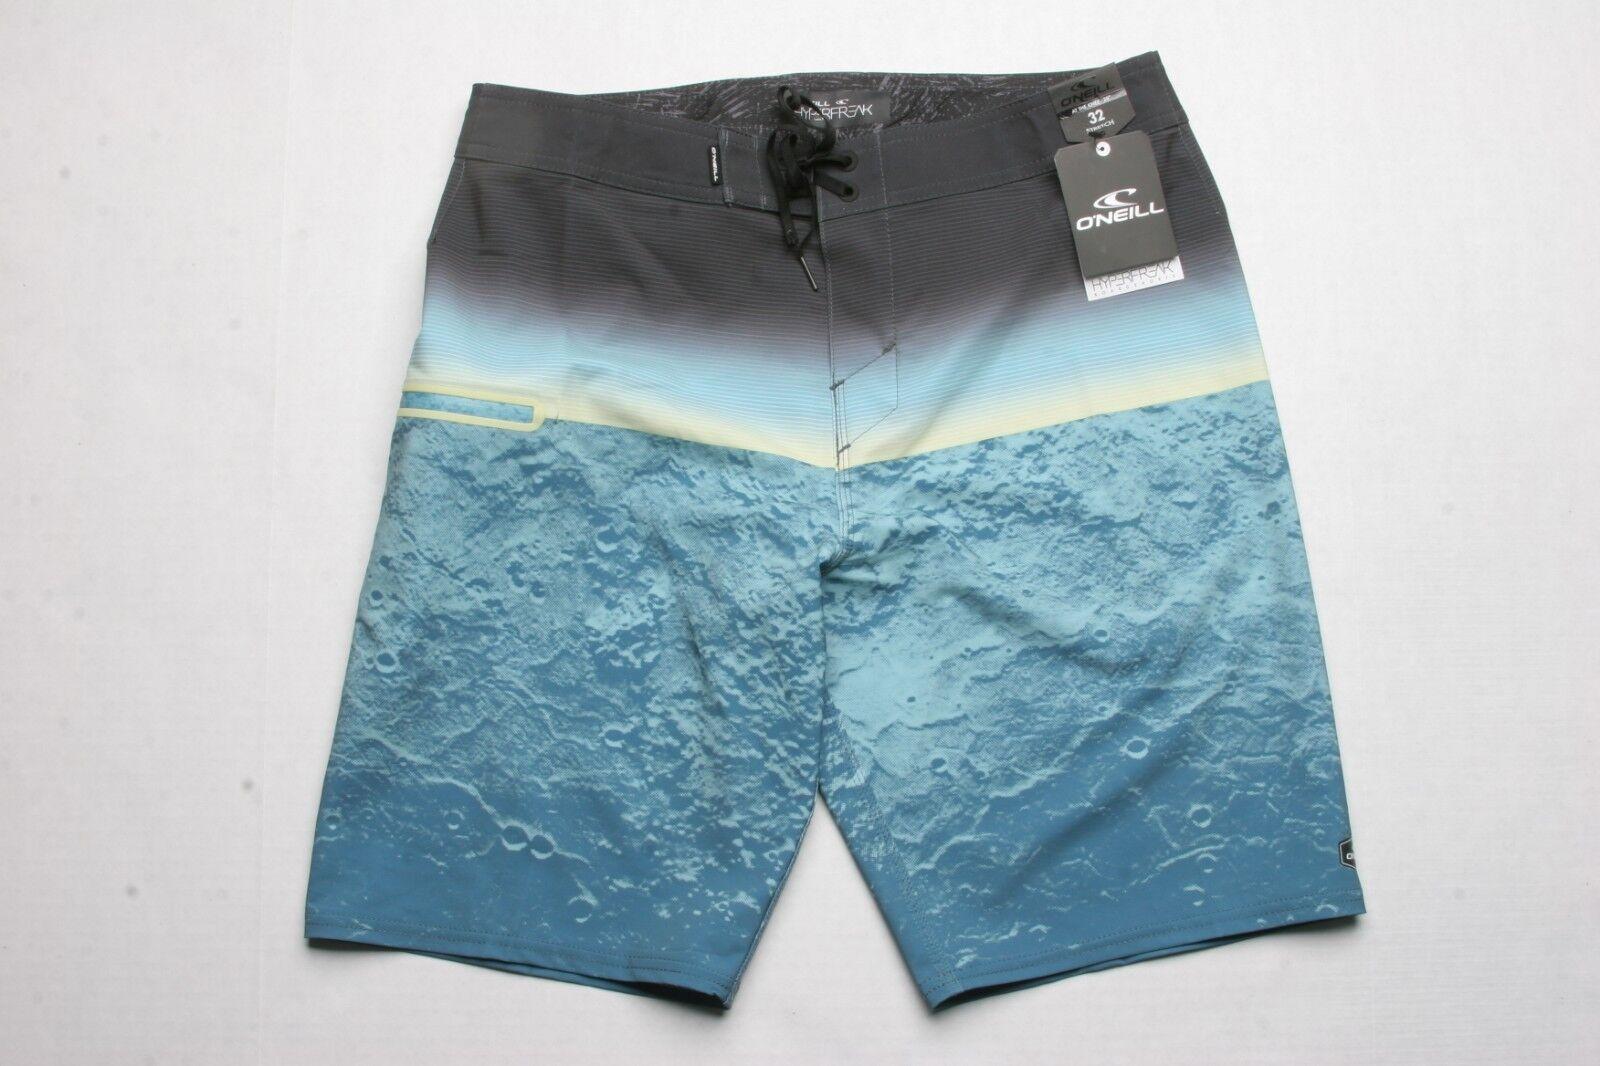 O'Neill Hyperfreak Boardshort (32) Grey